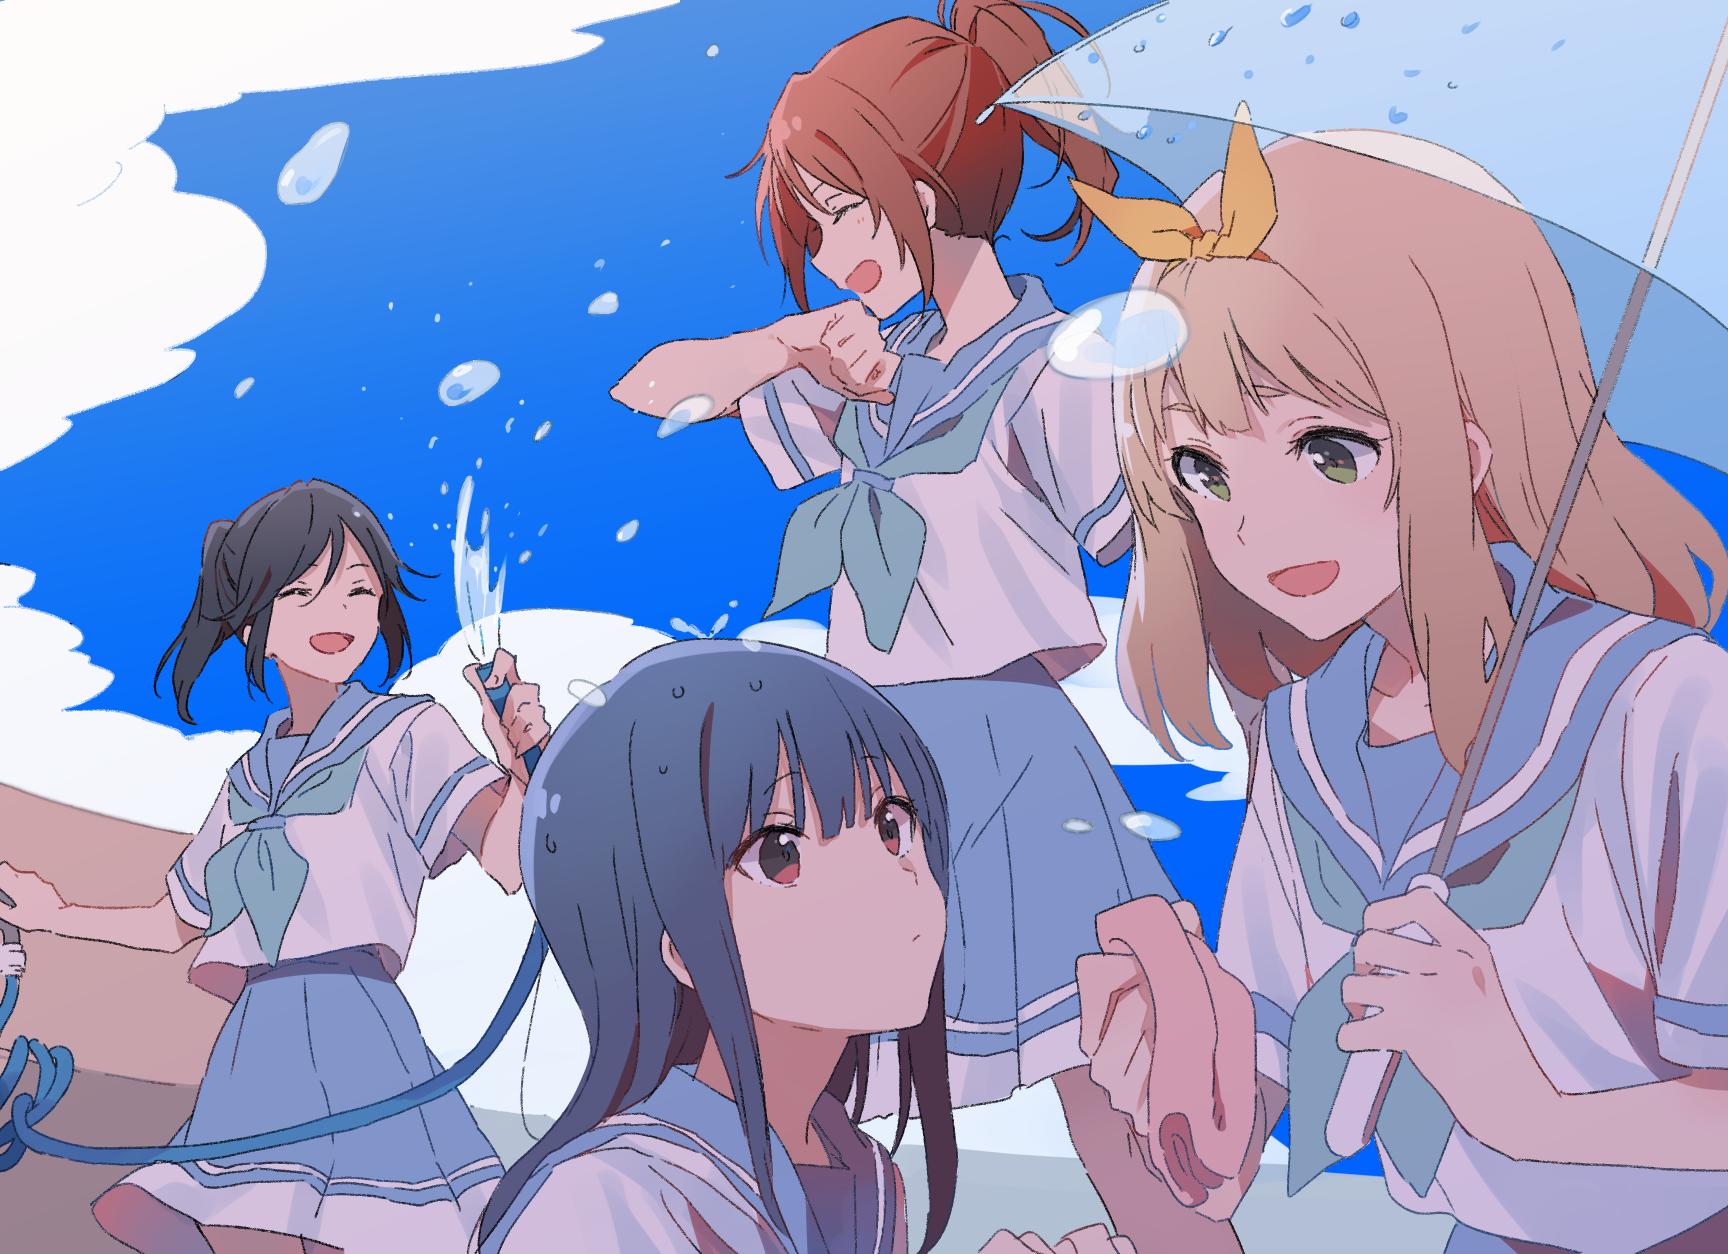 Anime 1728x1254 anime anime girls digital art artwork 2D Hibike! Euphonium Kasaki Nozomi Yoroizuka Mizore (Hibike! Euphonium) Nakagawa Natsuki Yoshikawa Yuuko